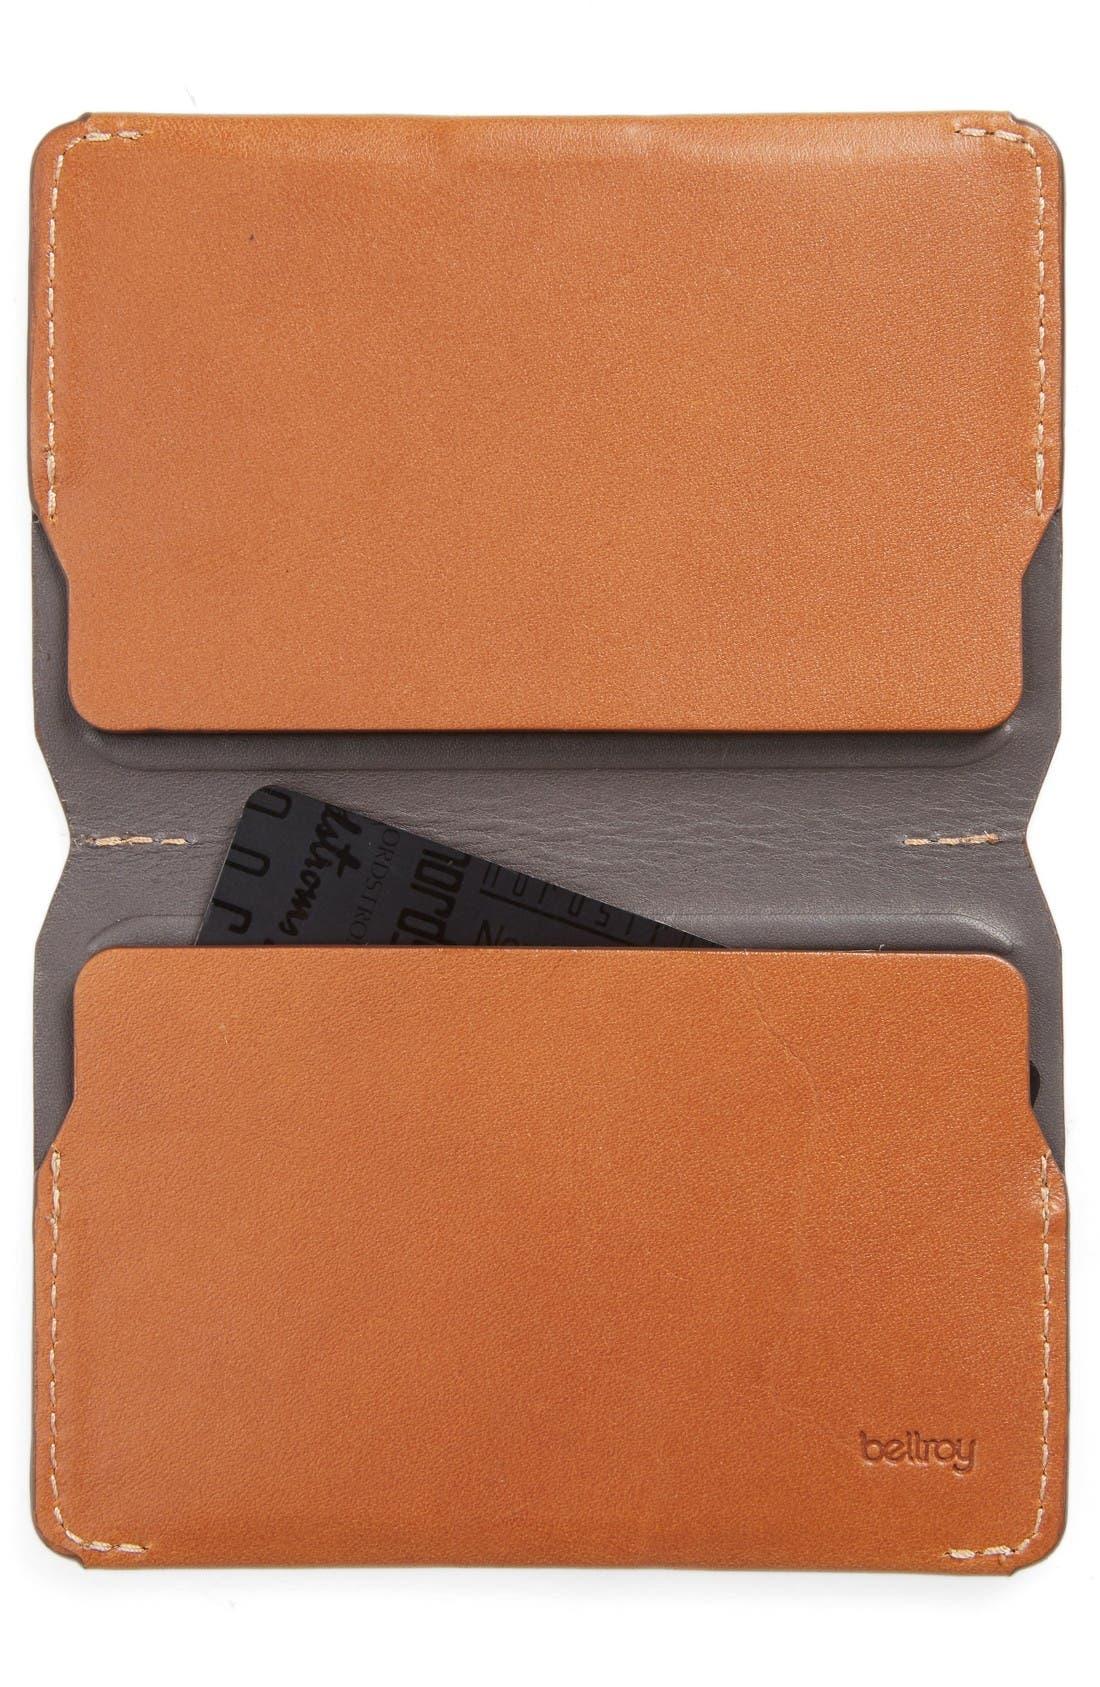 Leather Card Case,                             Alternate thumbnail 2, color,                             Caramel